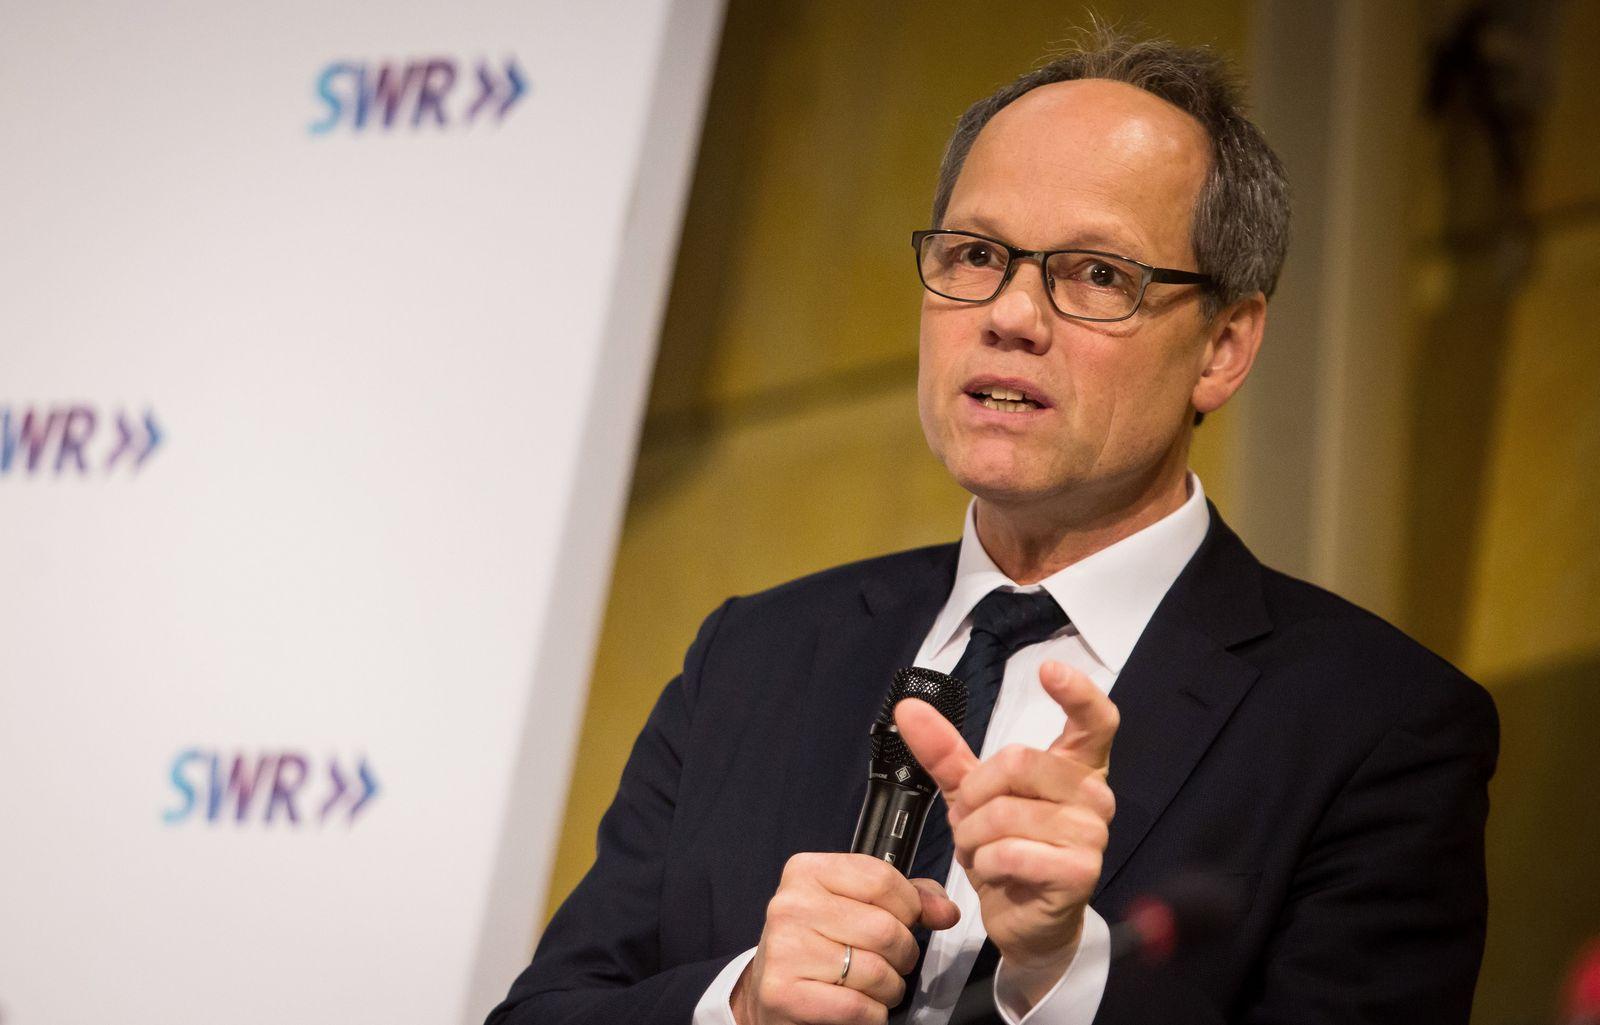 SWR-Intendant Kai Gniffke